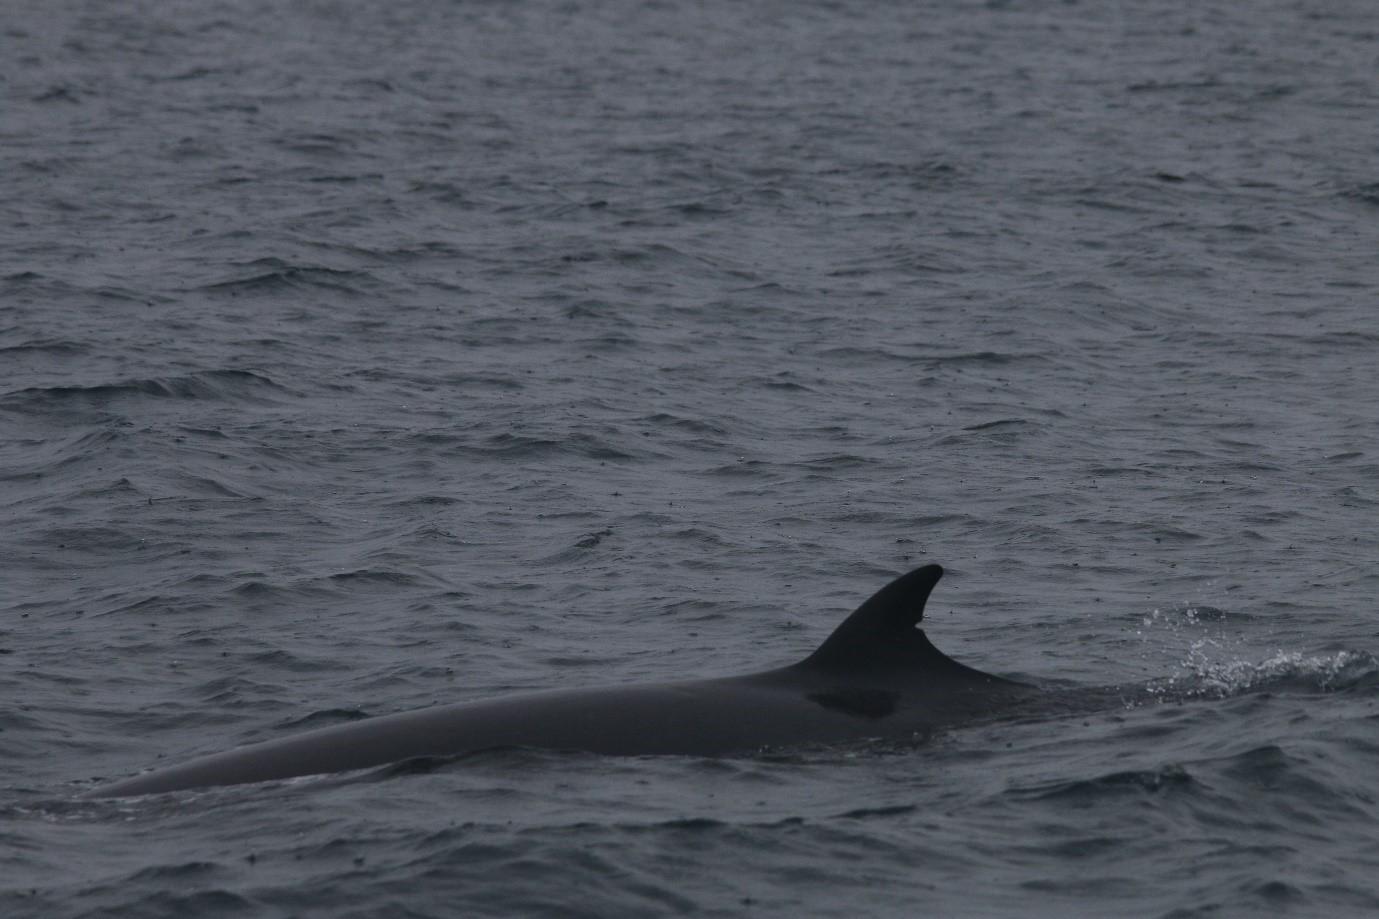 One of the feeding minke whales encountered across the minch